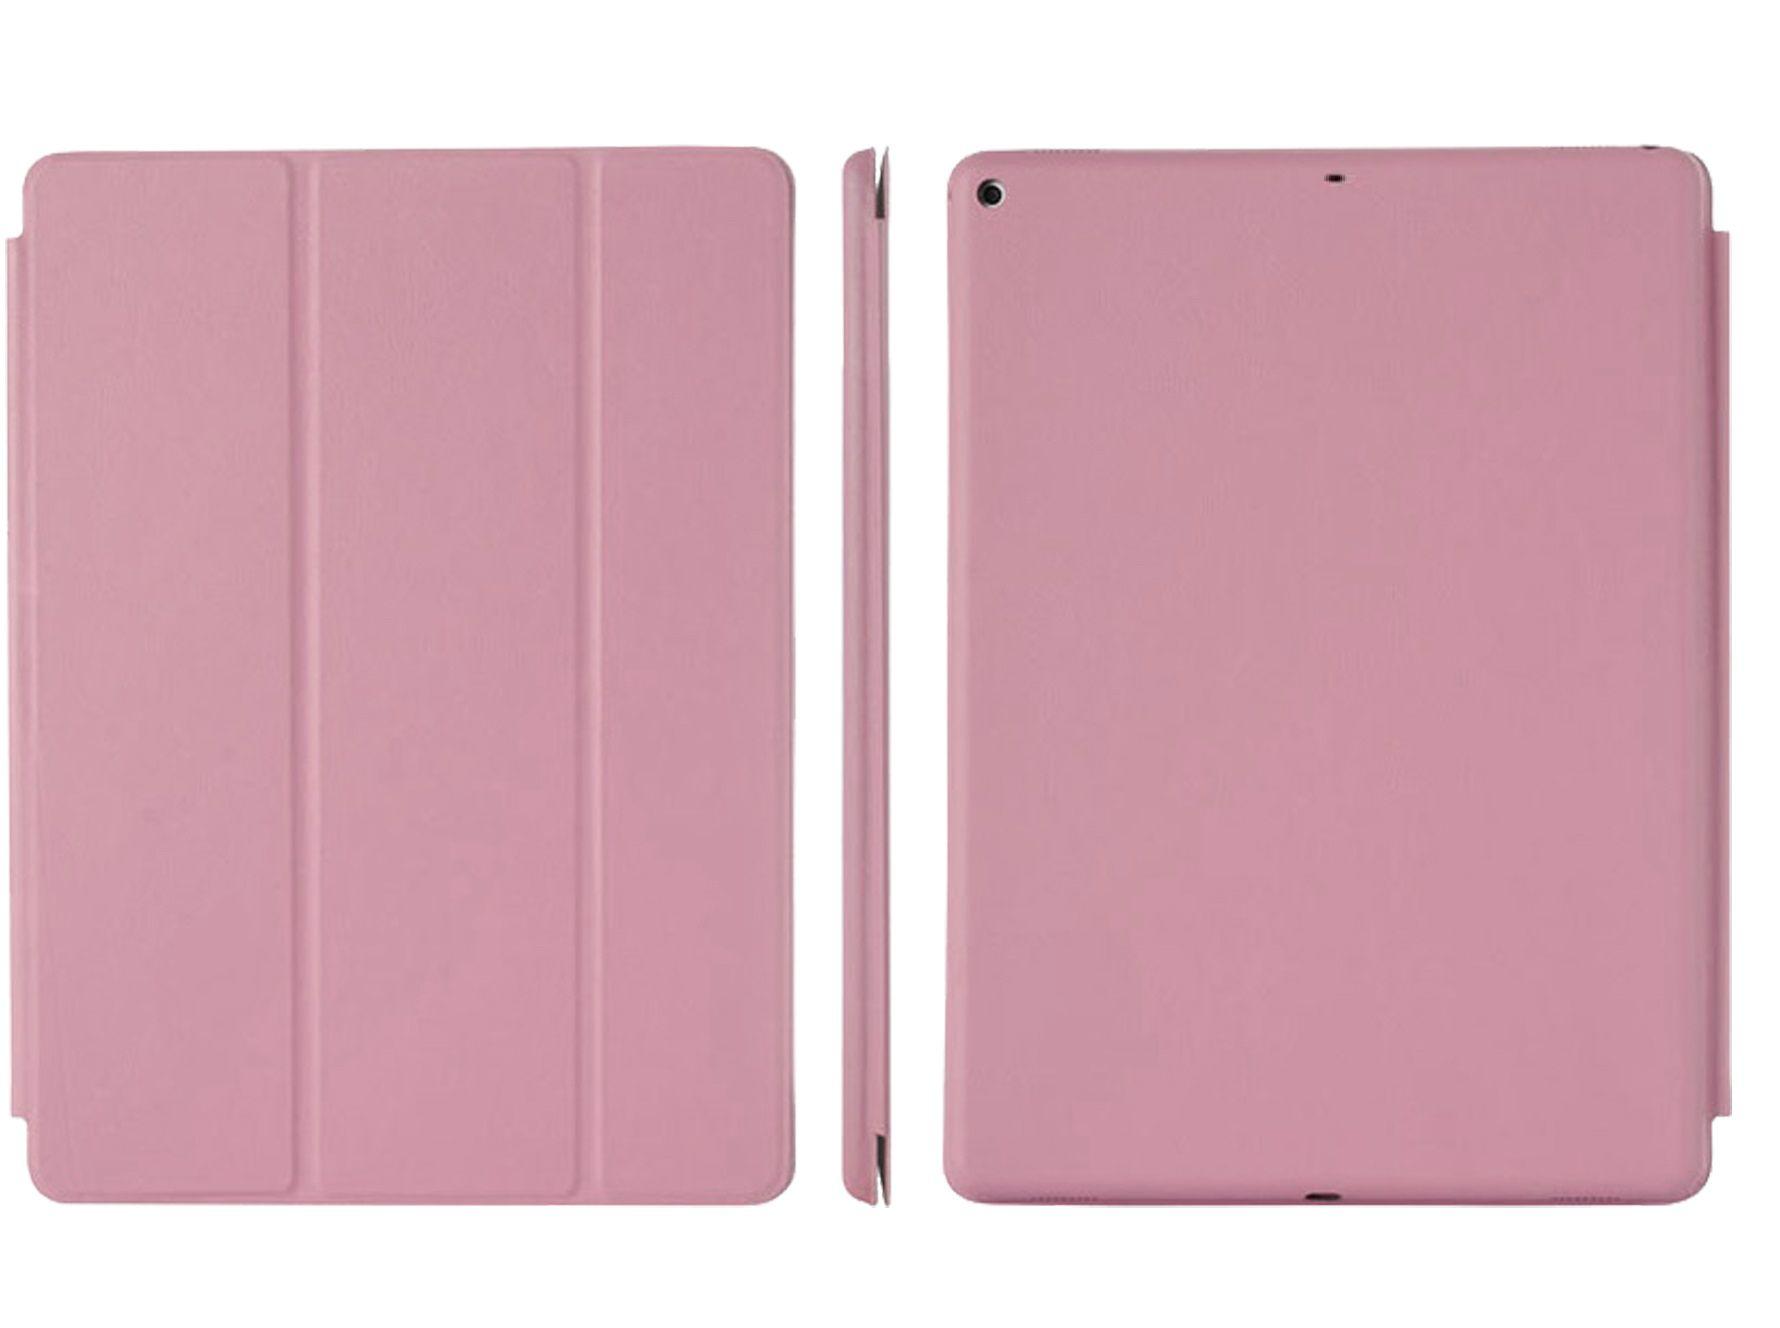 Smart Case Ipad 7 Tela 10.2 Ano 2019 A2197 A2198 A2199 Rosa Médio